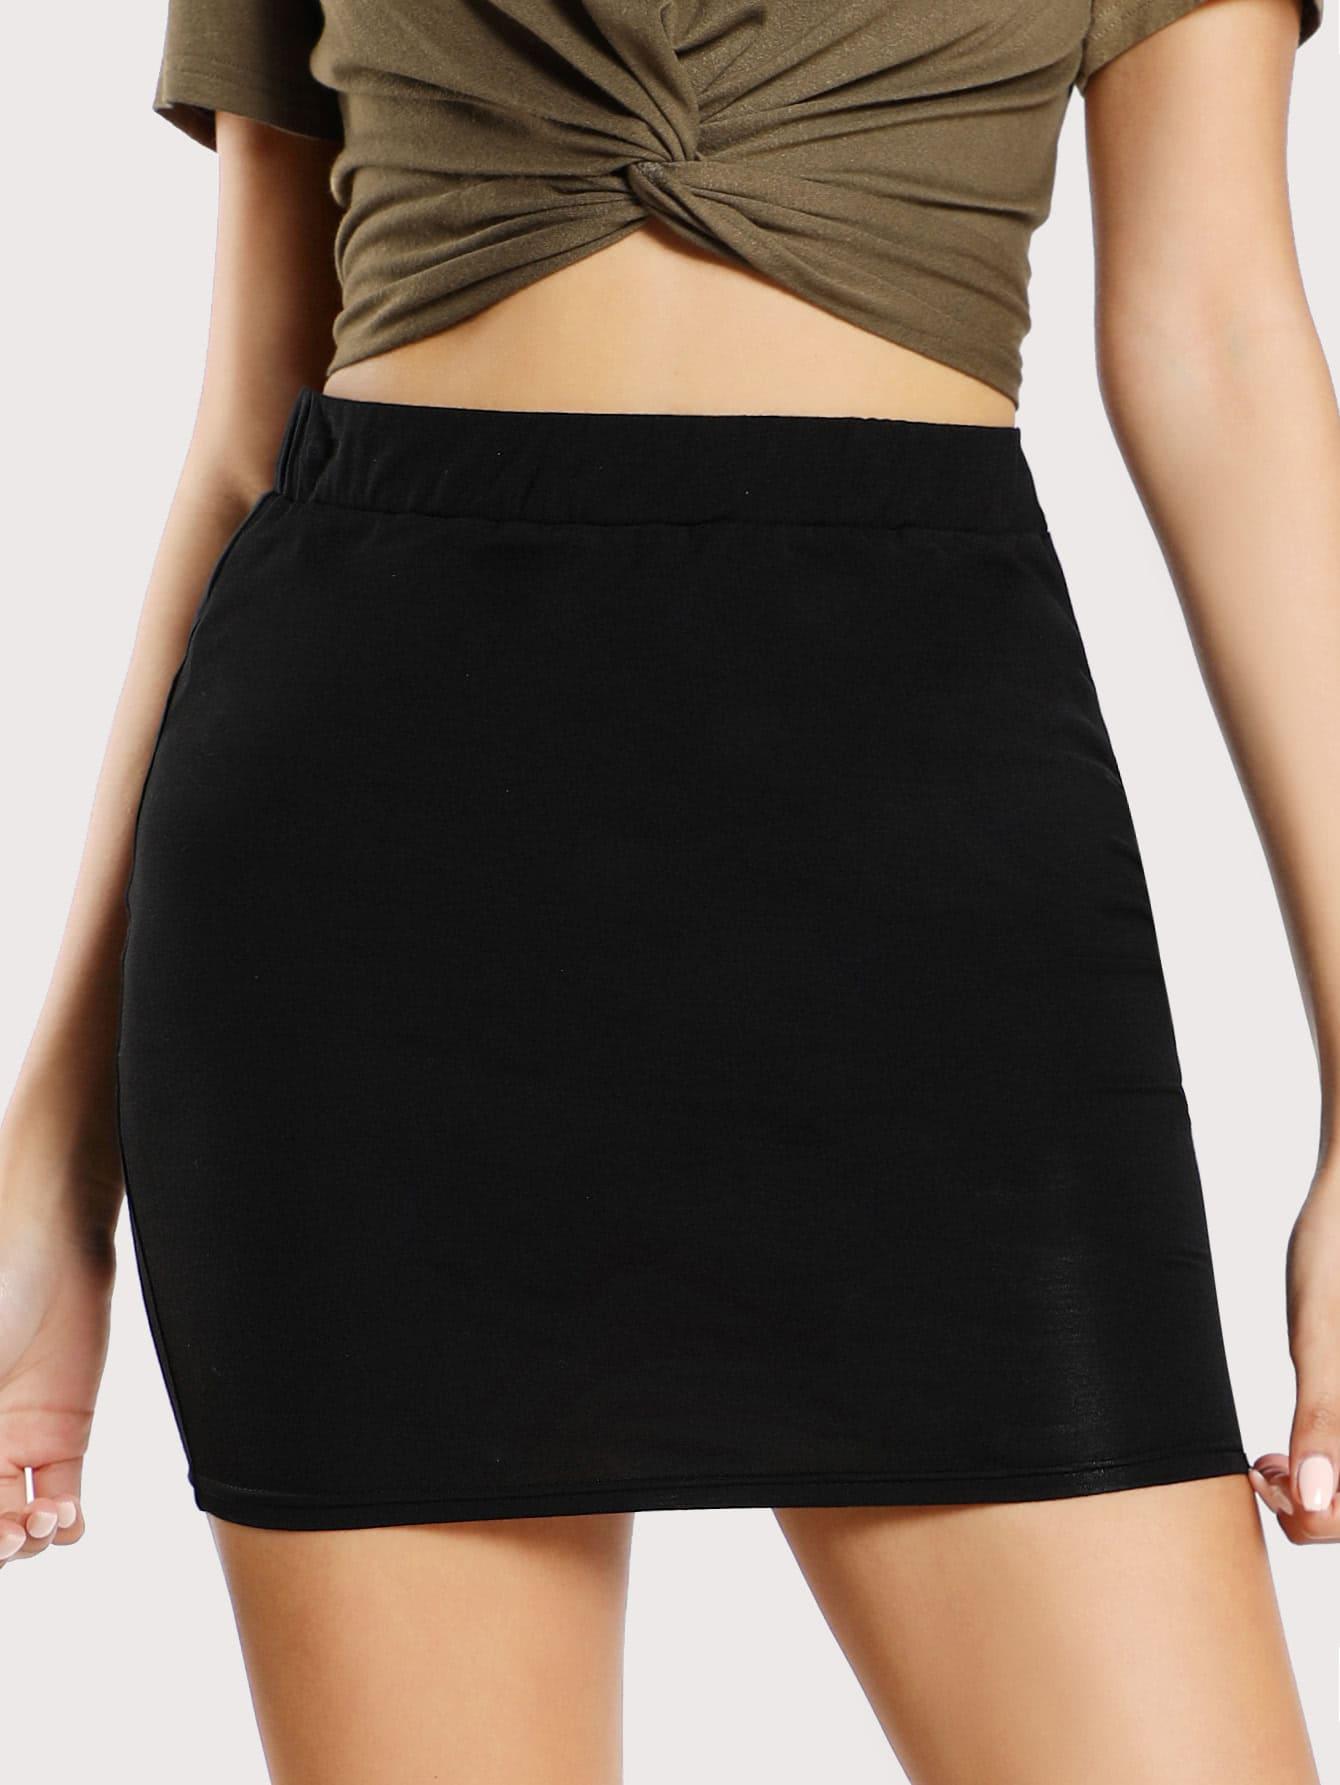 Elastic Waist Bodycon Jersey Skirt heather grey elastic waist jersey pencil skirt